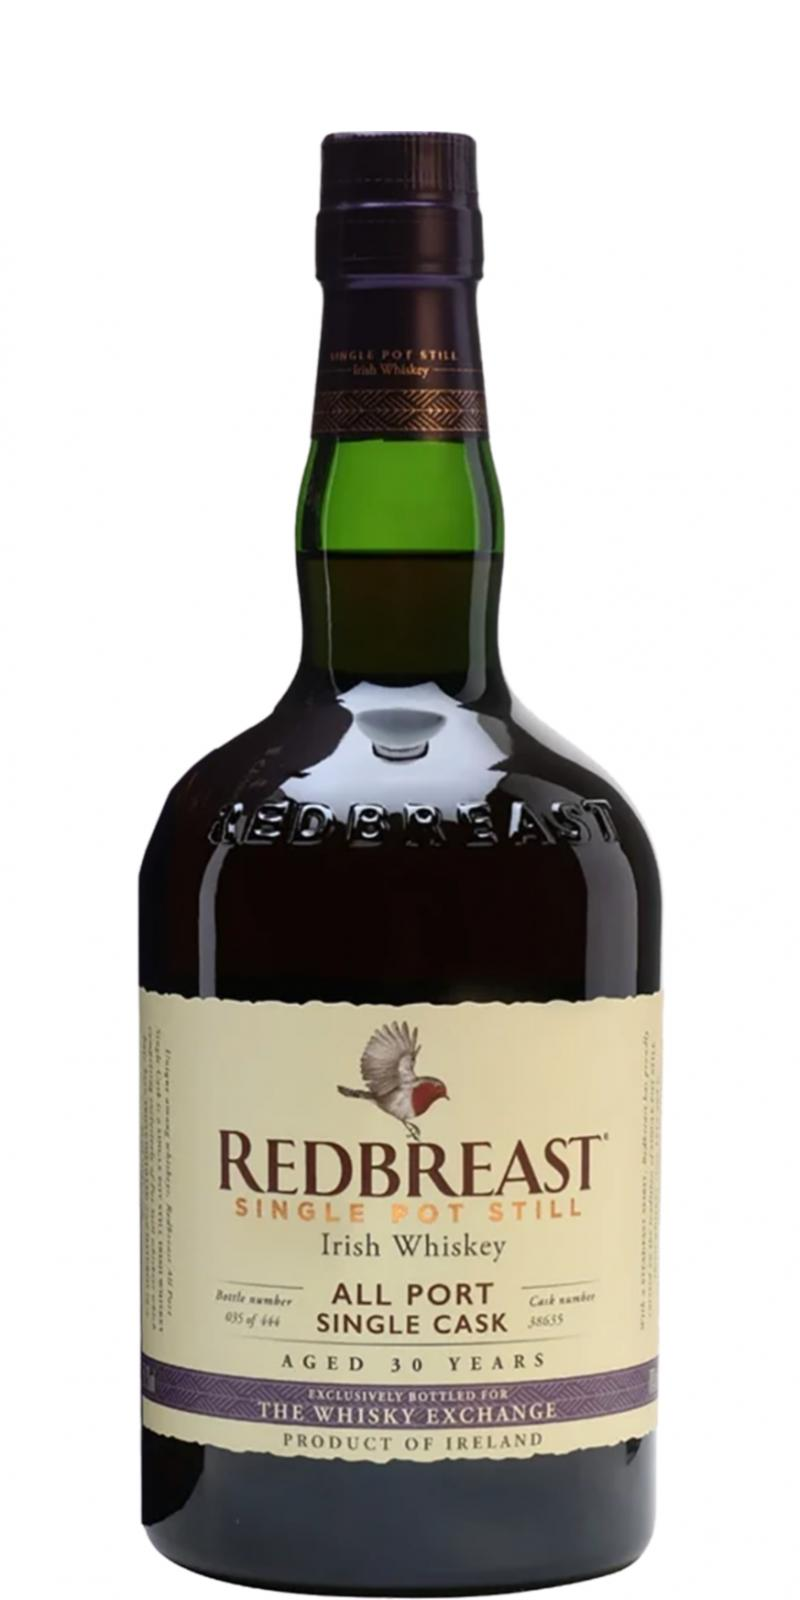 Redbreast 1989